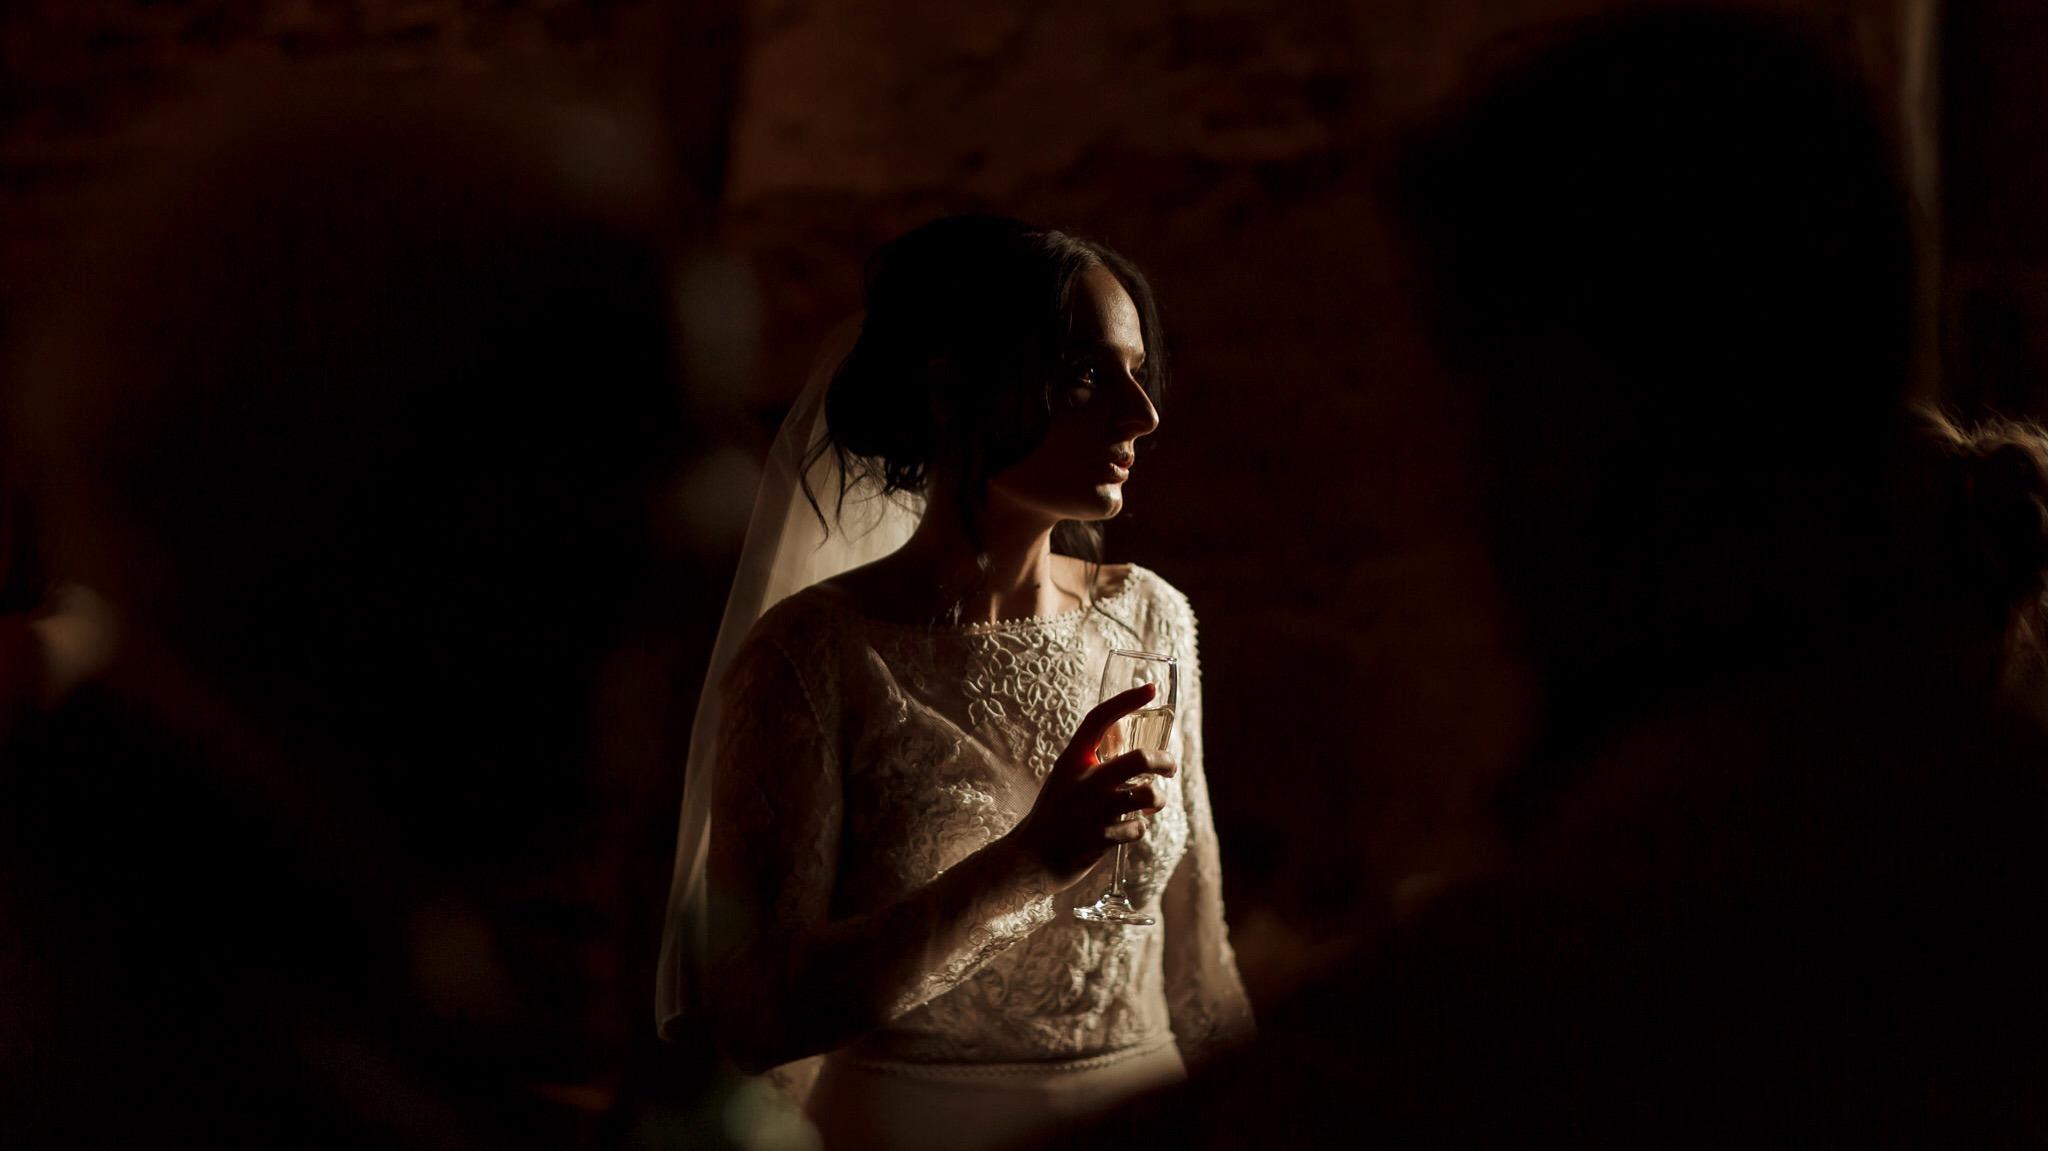 York Based Rock My Wedding Photographer | Hollie